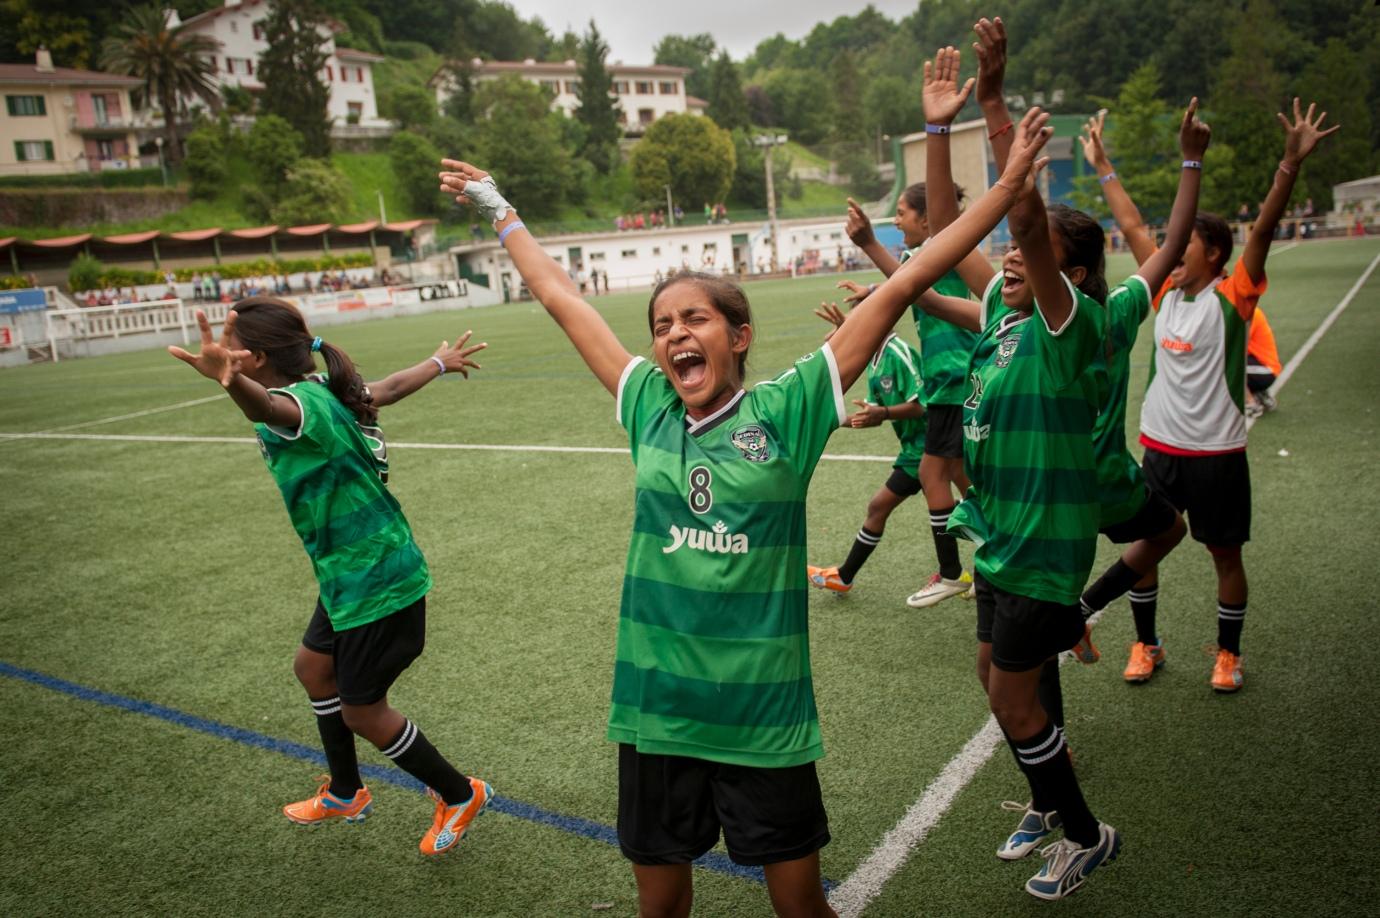 Yuwa team celebrates goal at the Donostia-San Sebastian